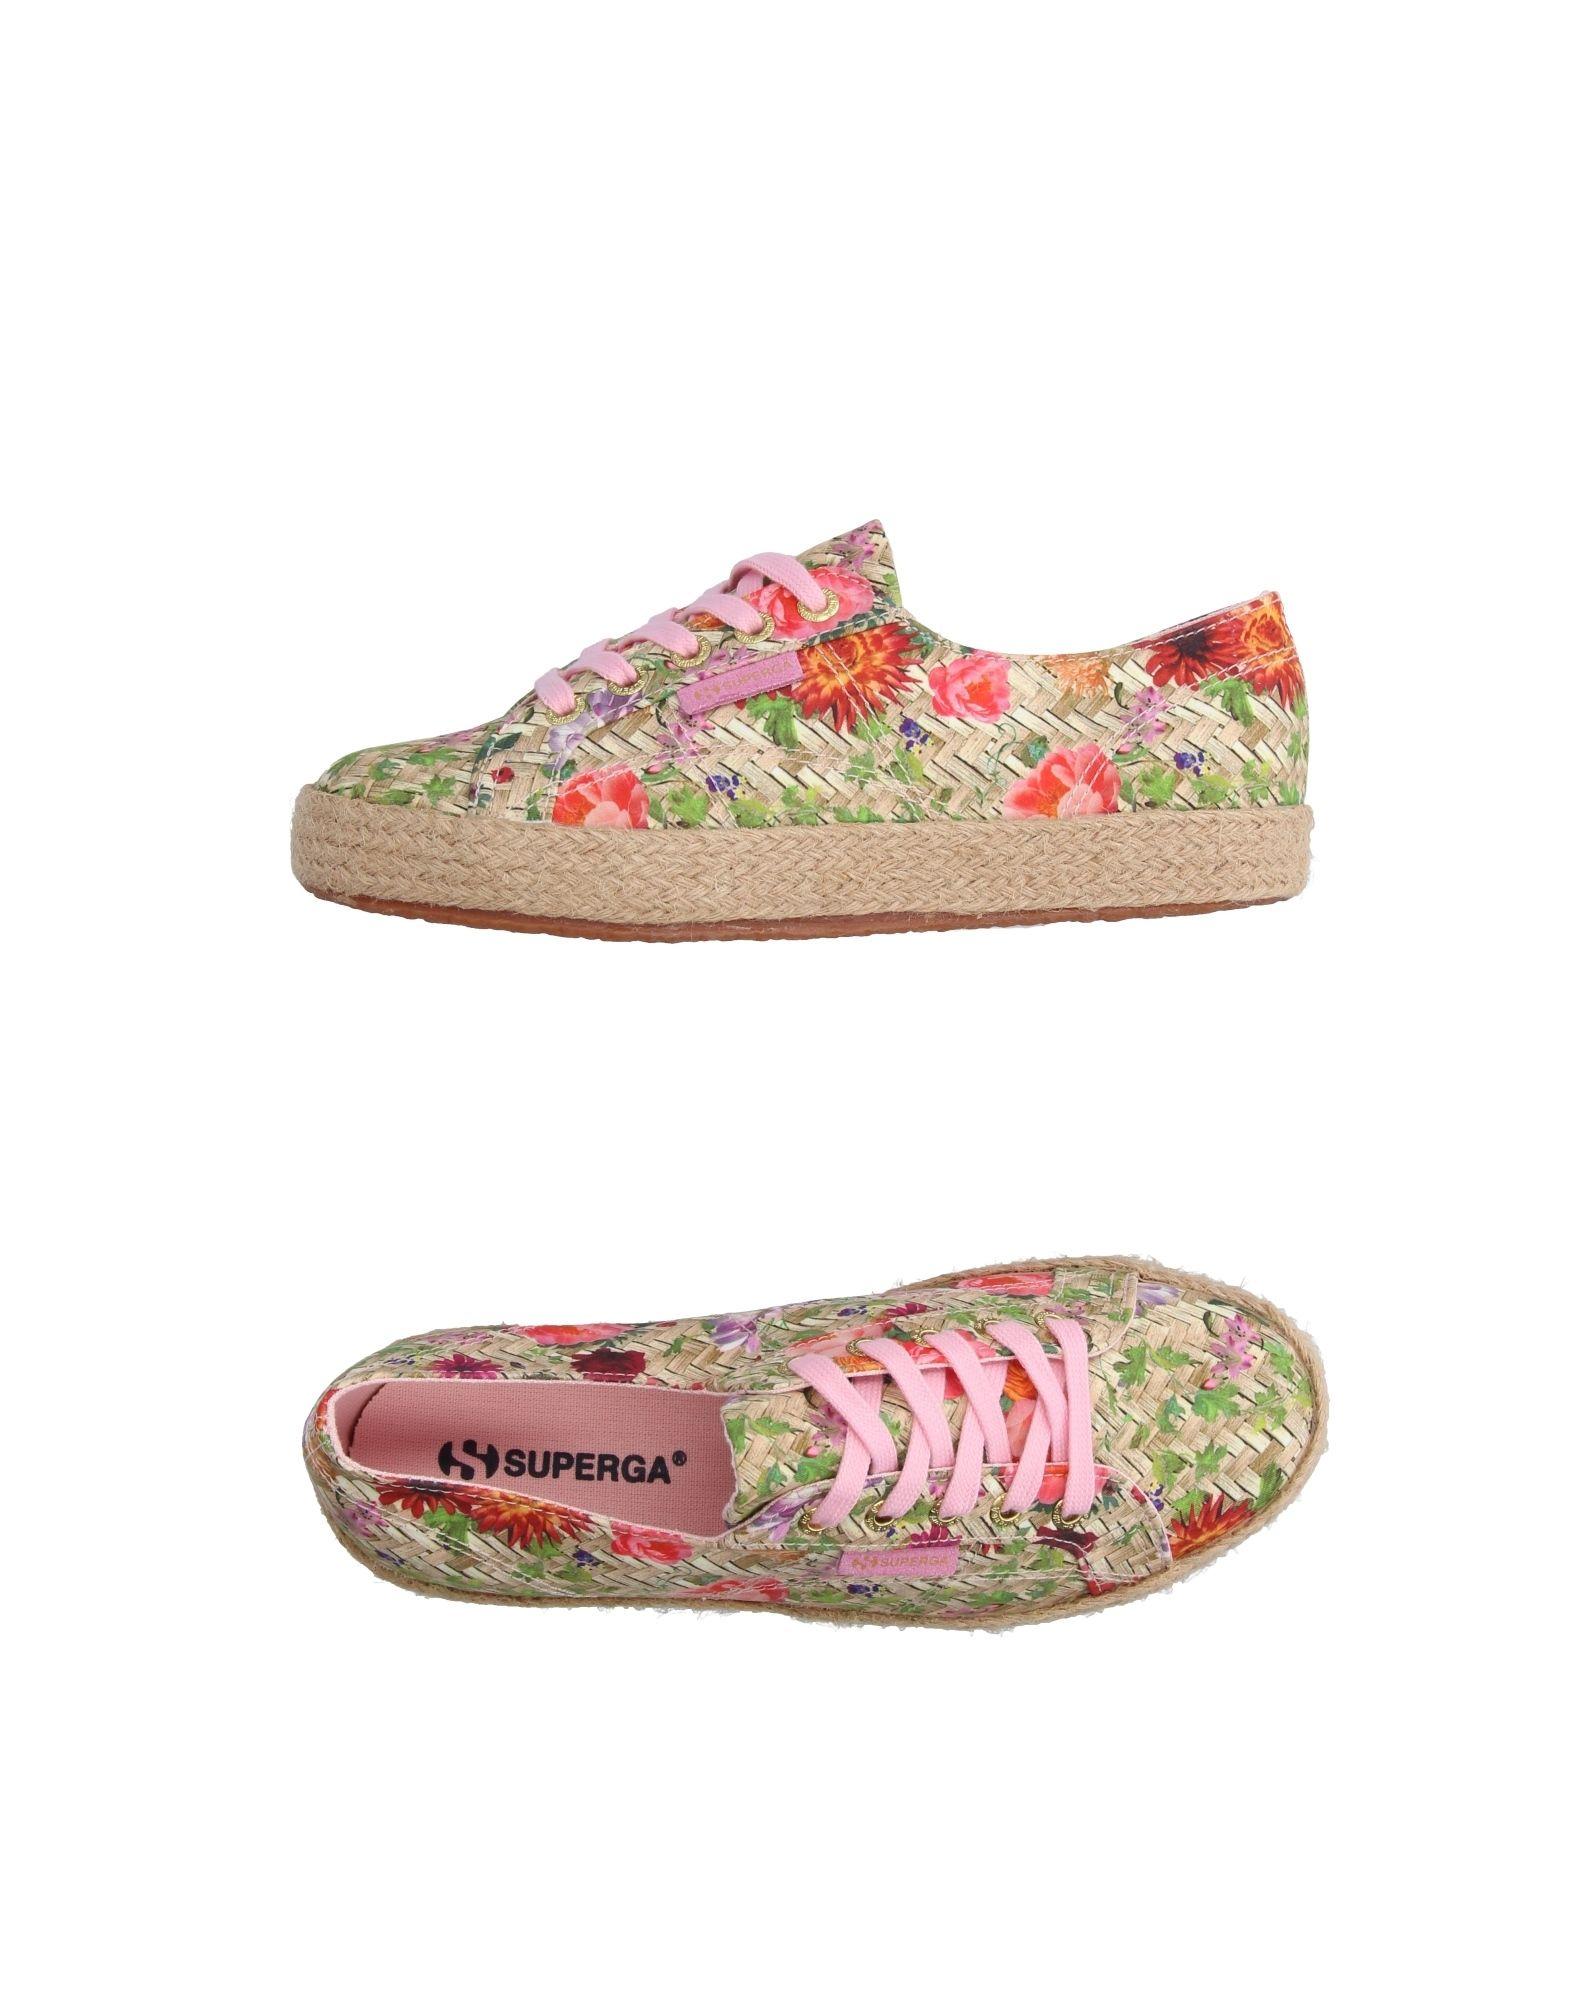 Superga® Espadrilles Damen  11206333UU Gute Qualität beliebte Schuhe Schuhe Schuhe 560f0b